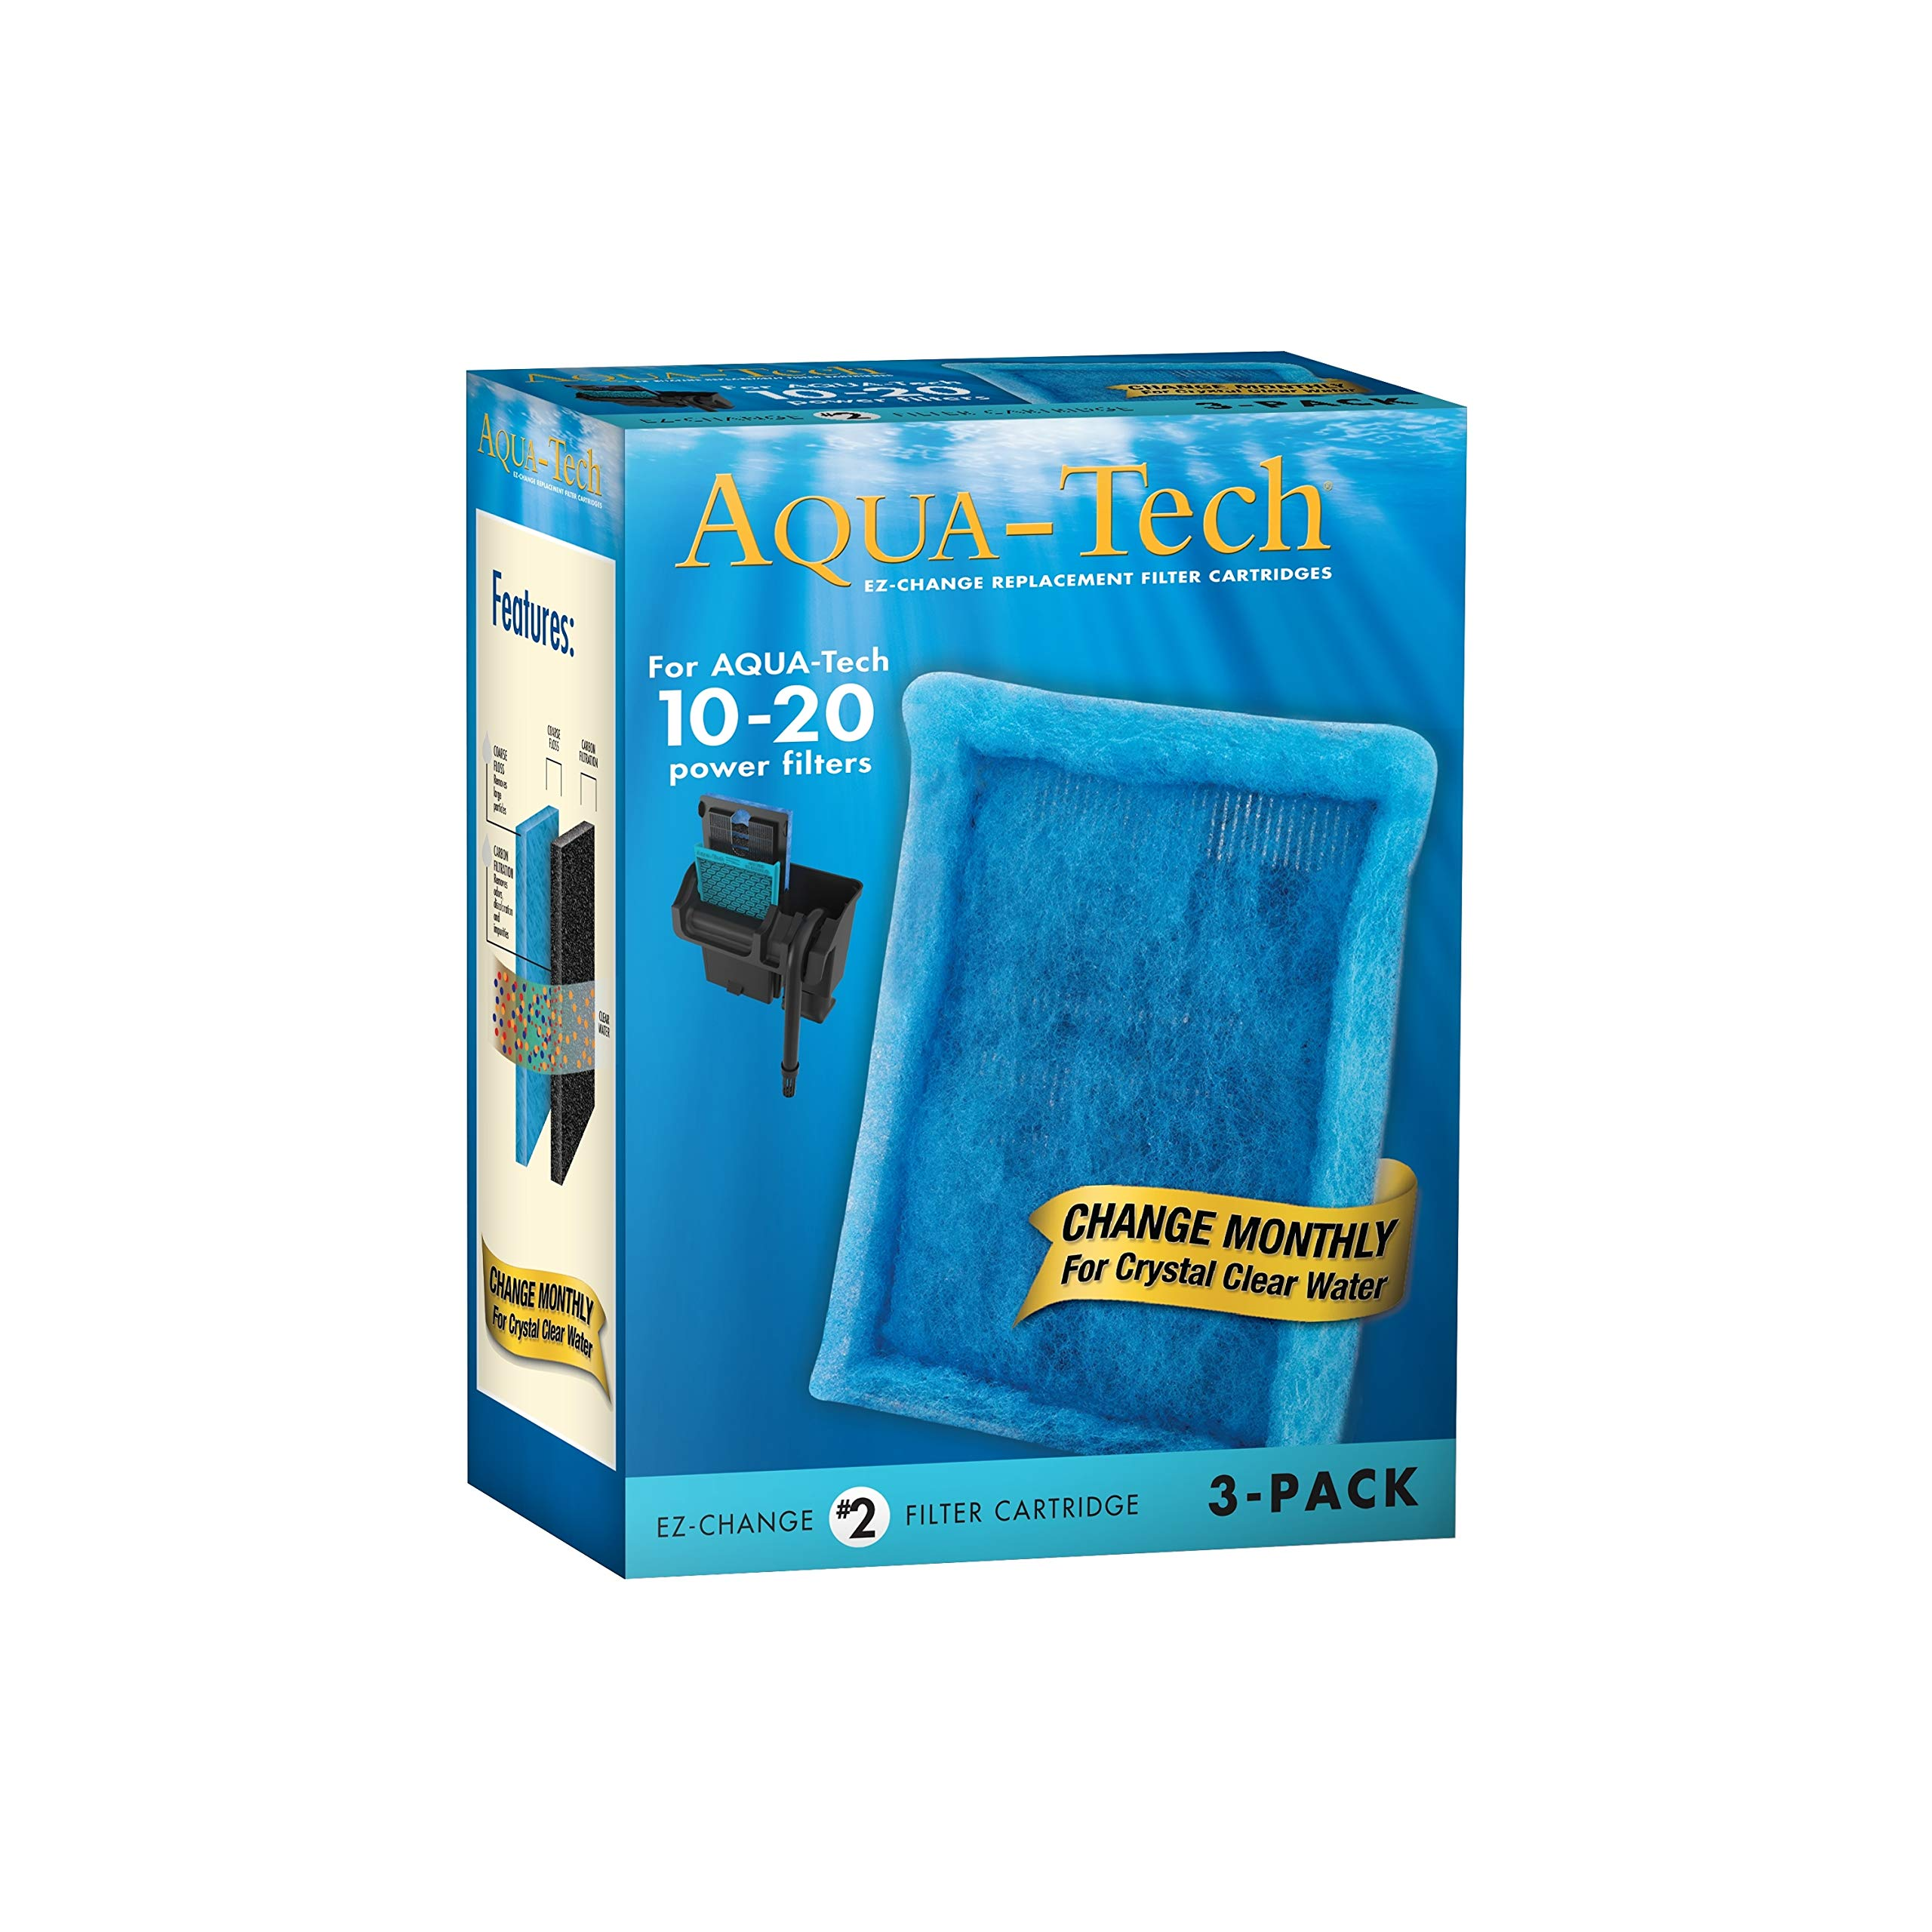 AquaTech EZ-Change 3-Pack Aquarium Filter Cartridge for 10 to 20 Power Filter